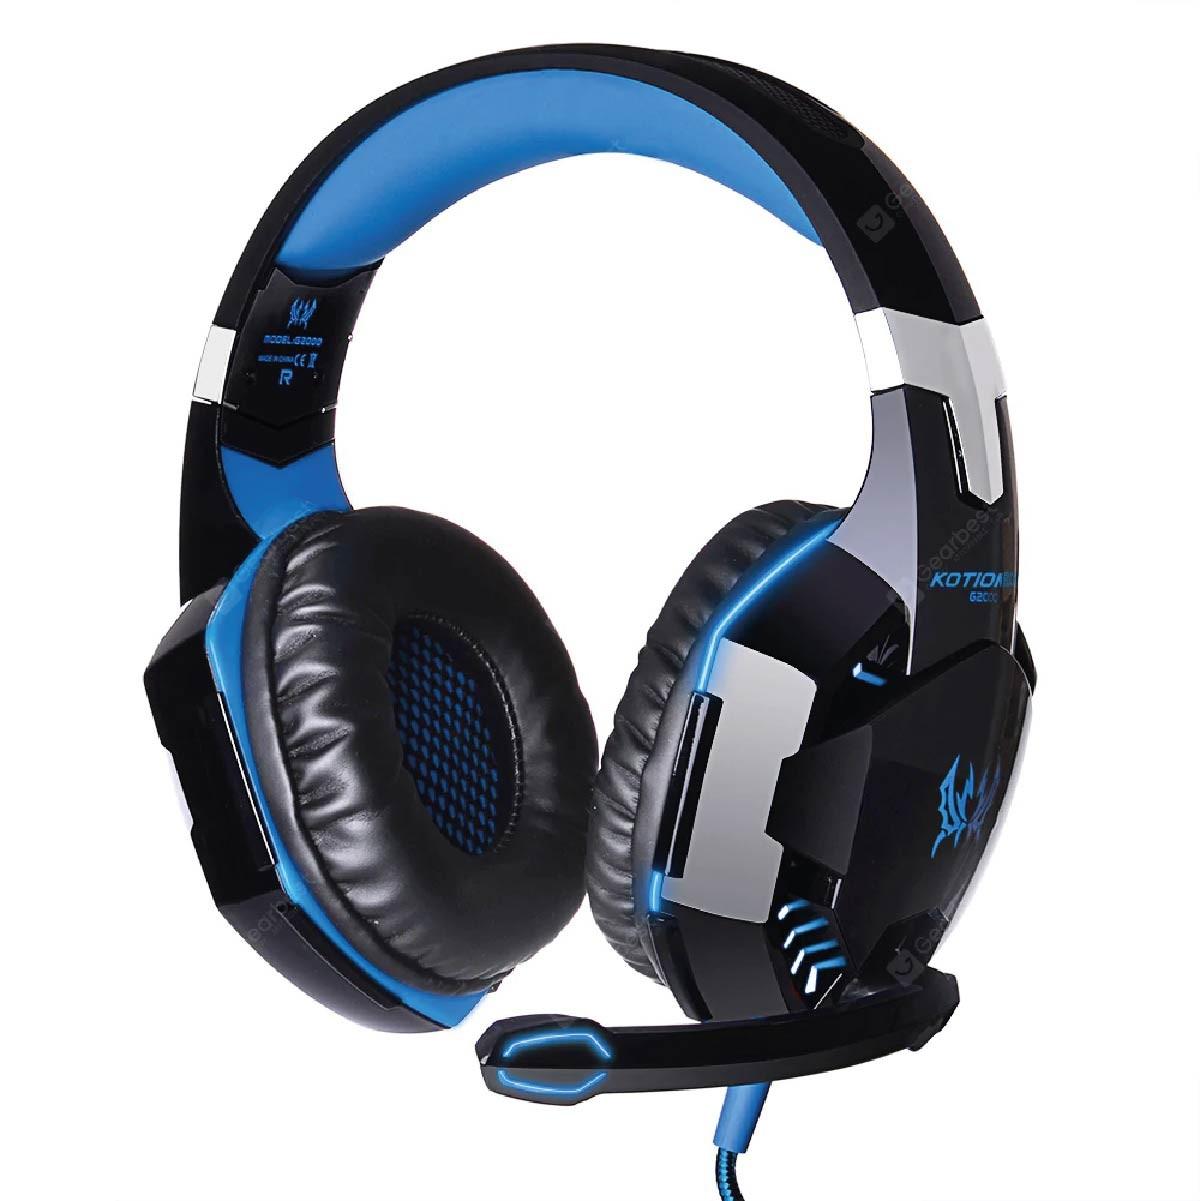 Headset Fone De Ouvido Profissional Gamer Kotion Each G2000 Azul